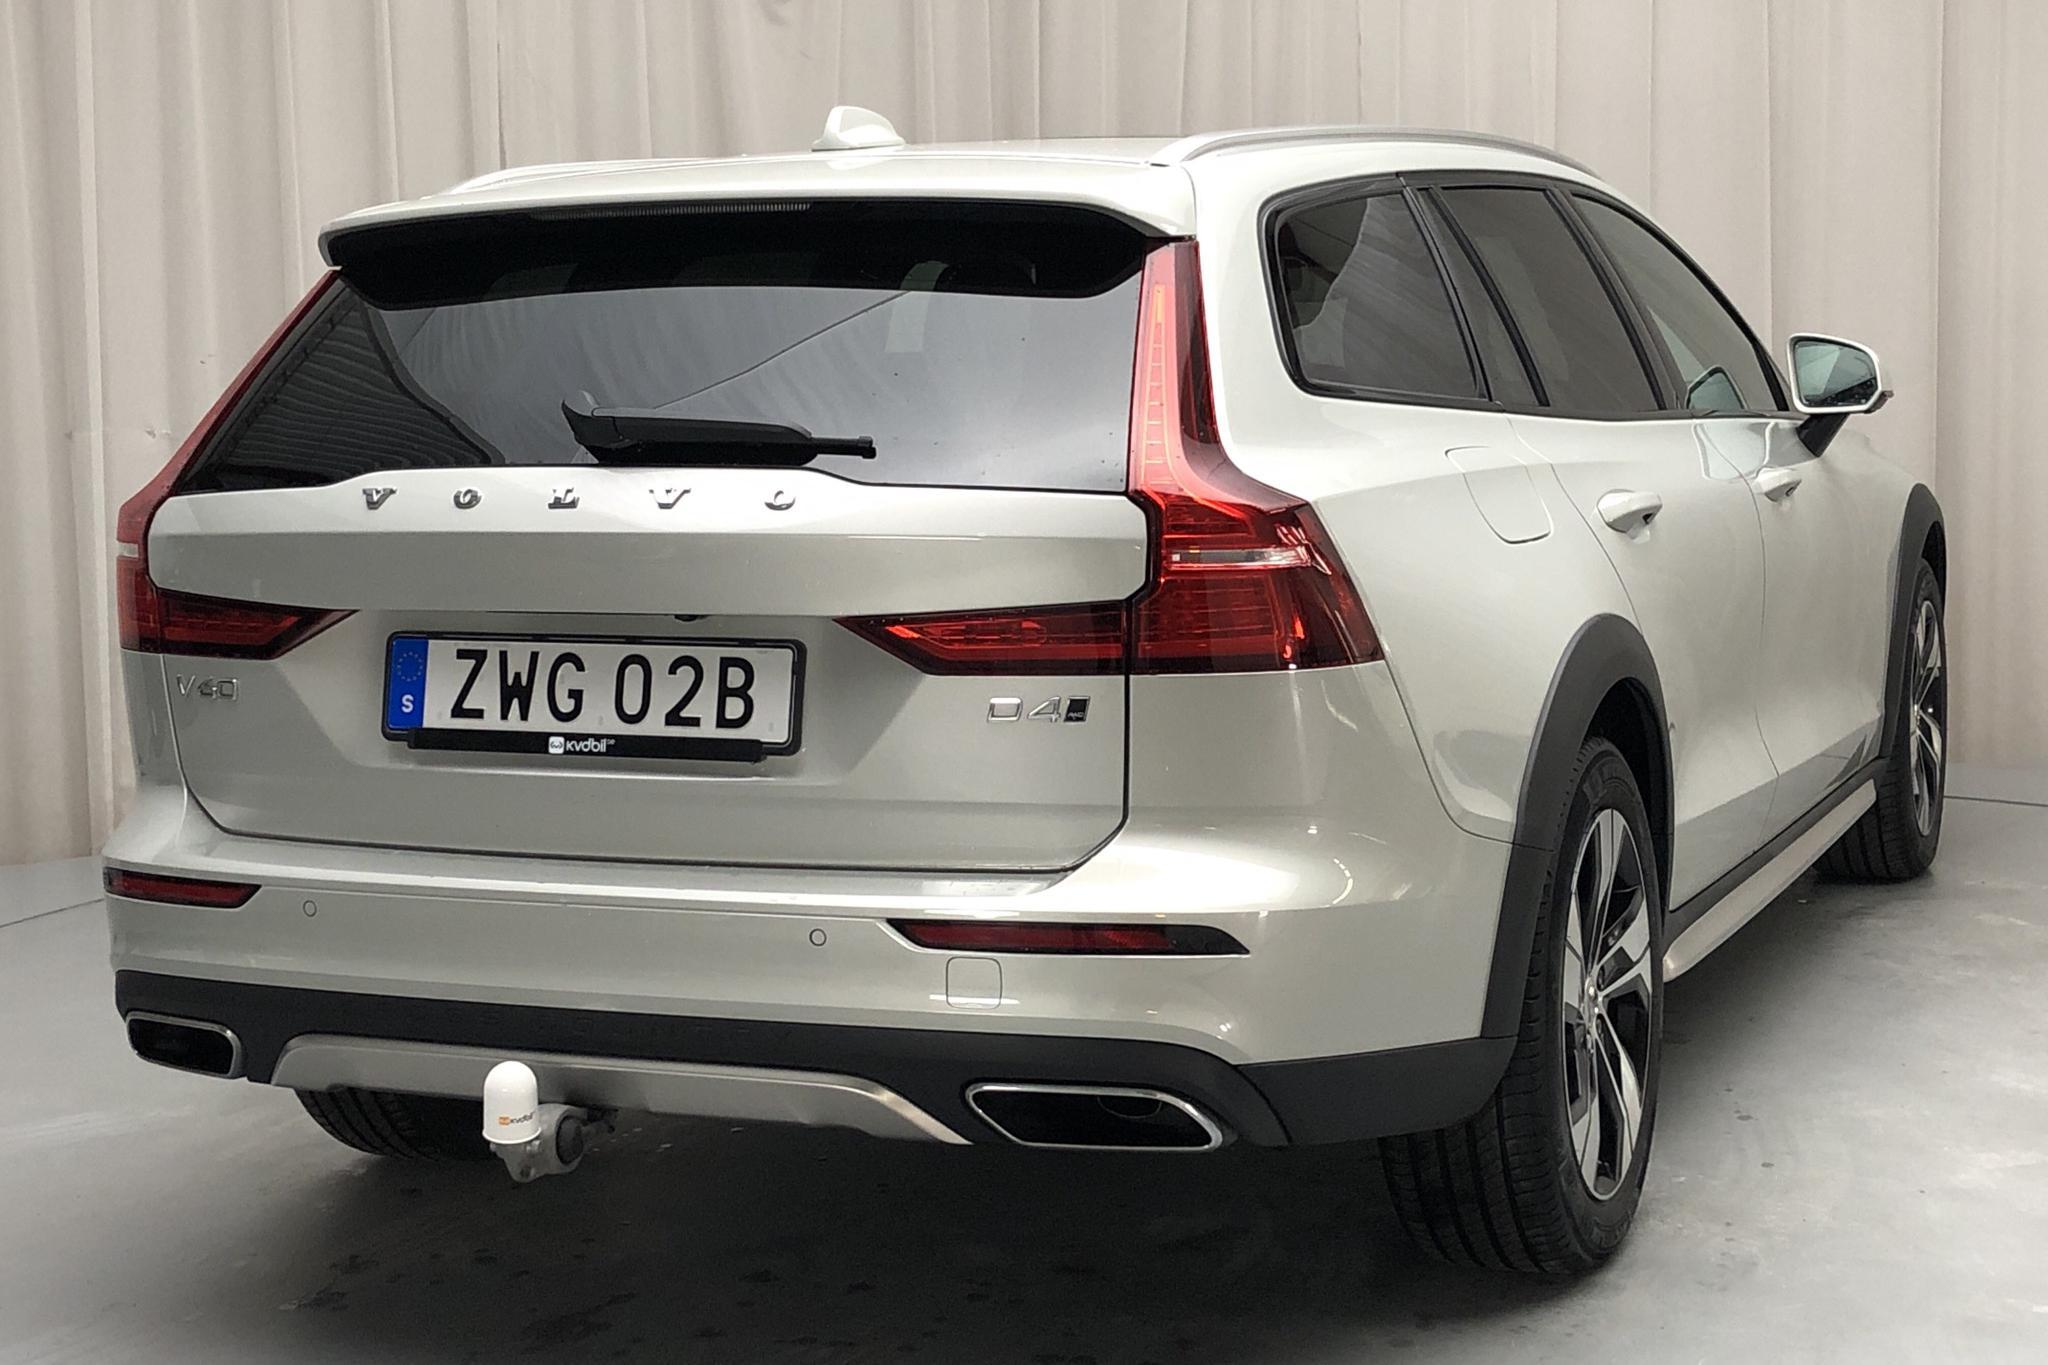 Volvo V60 D4 Cross Country AWD (190hk) - 50 550 km - Automatic - white - 2019